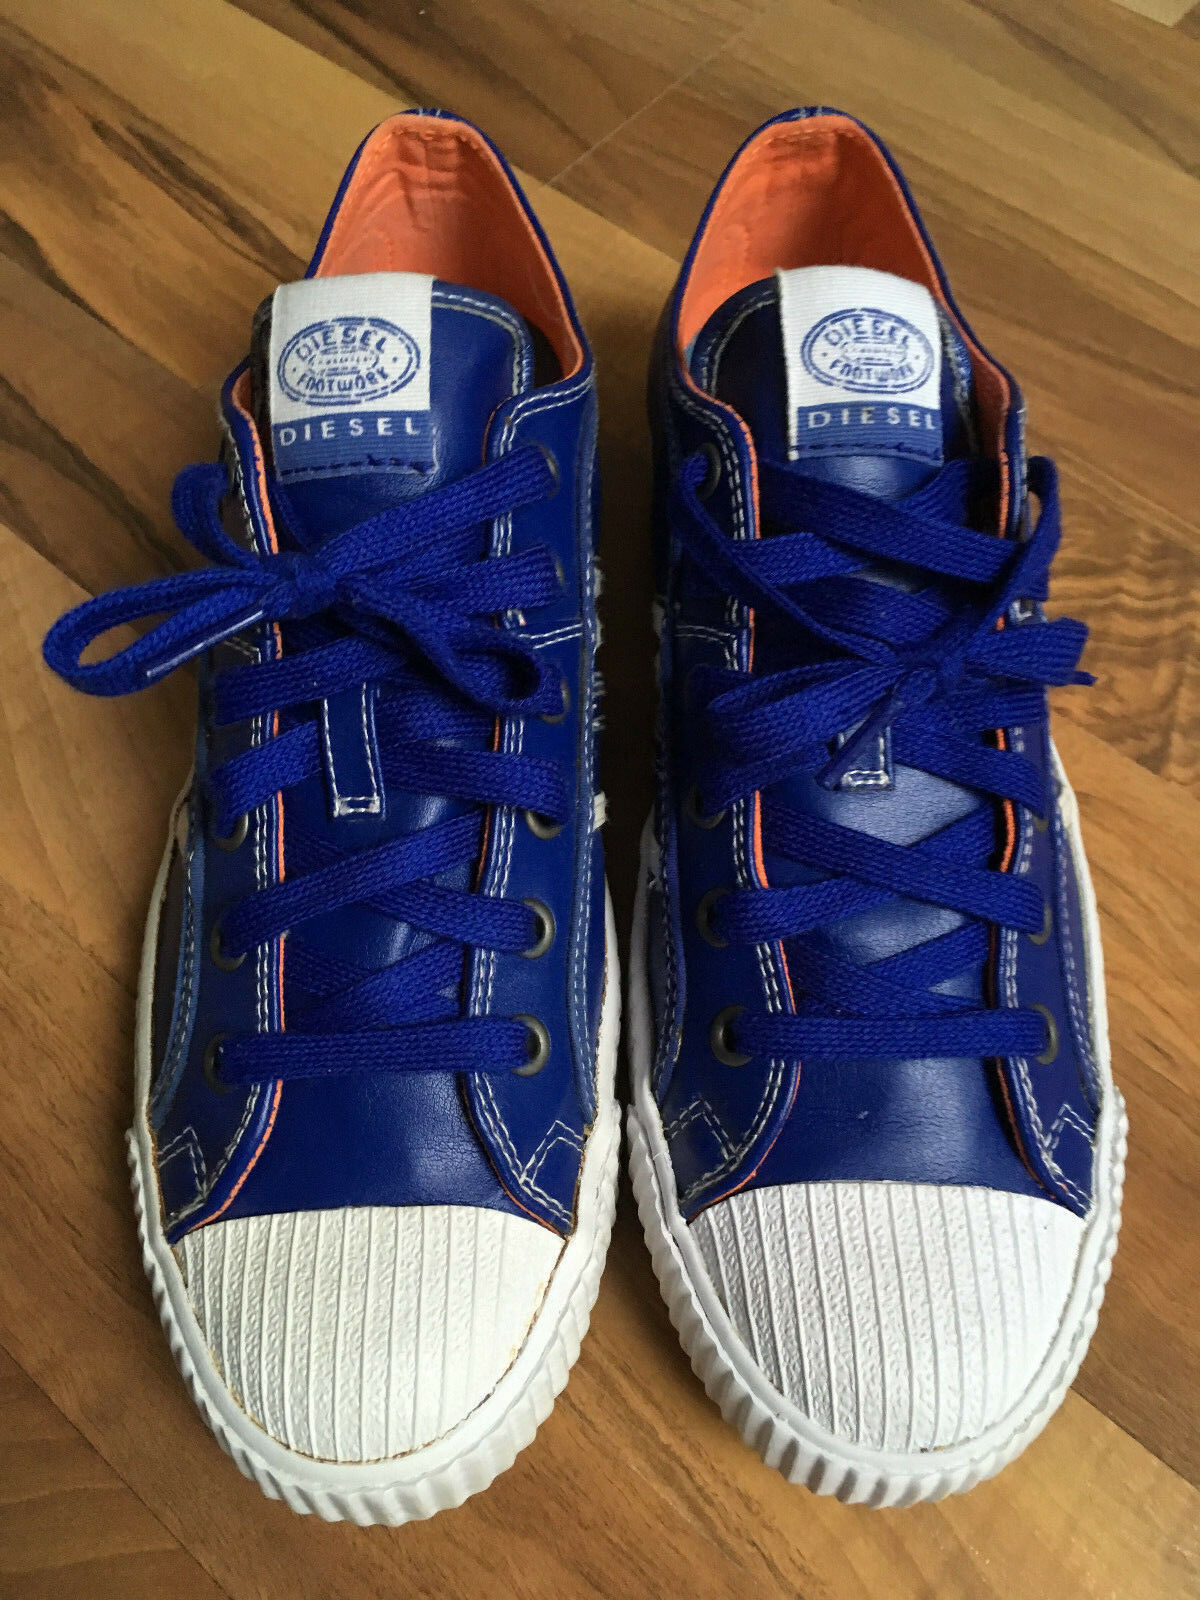 DIESEL Sneakers Größe EU 42 Neuwertig